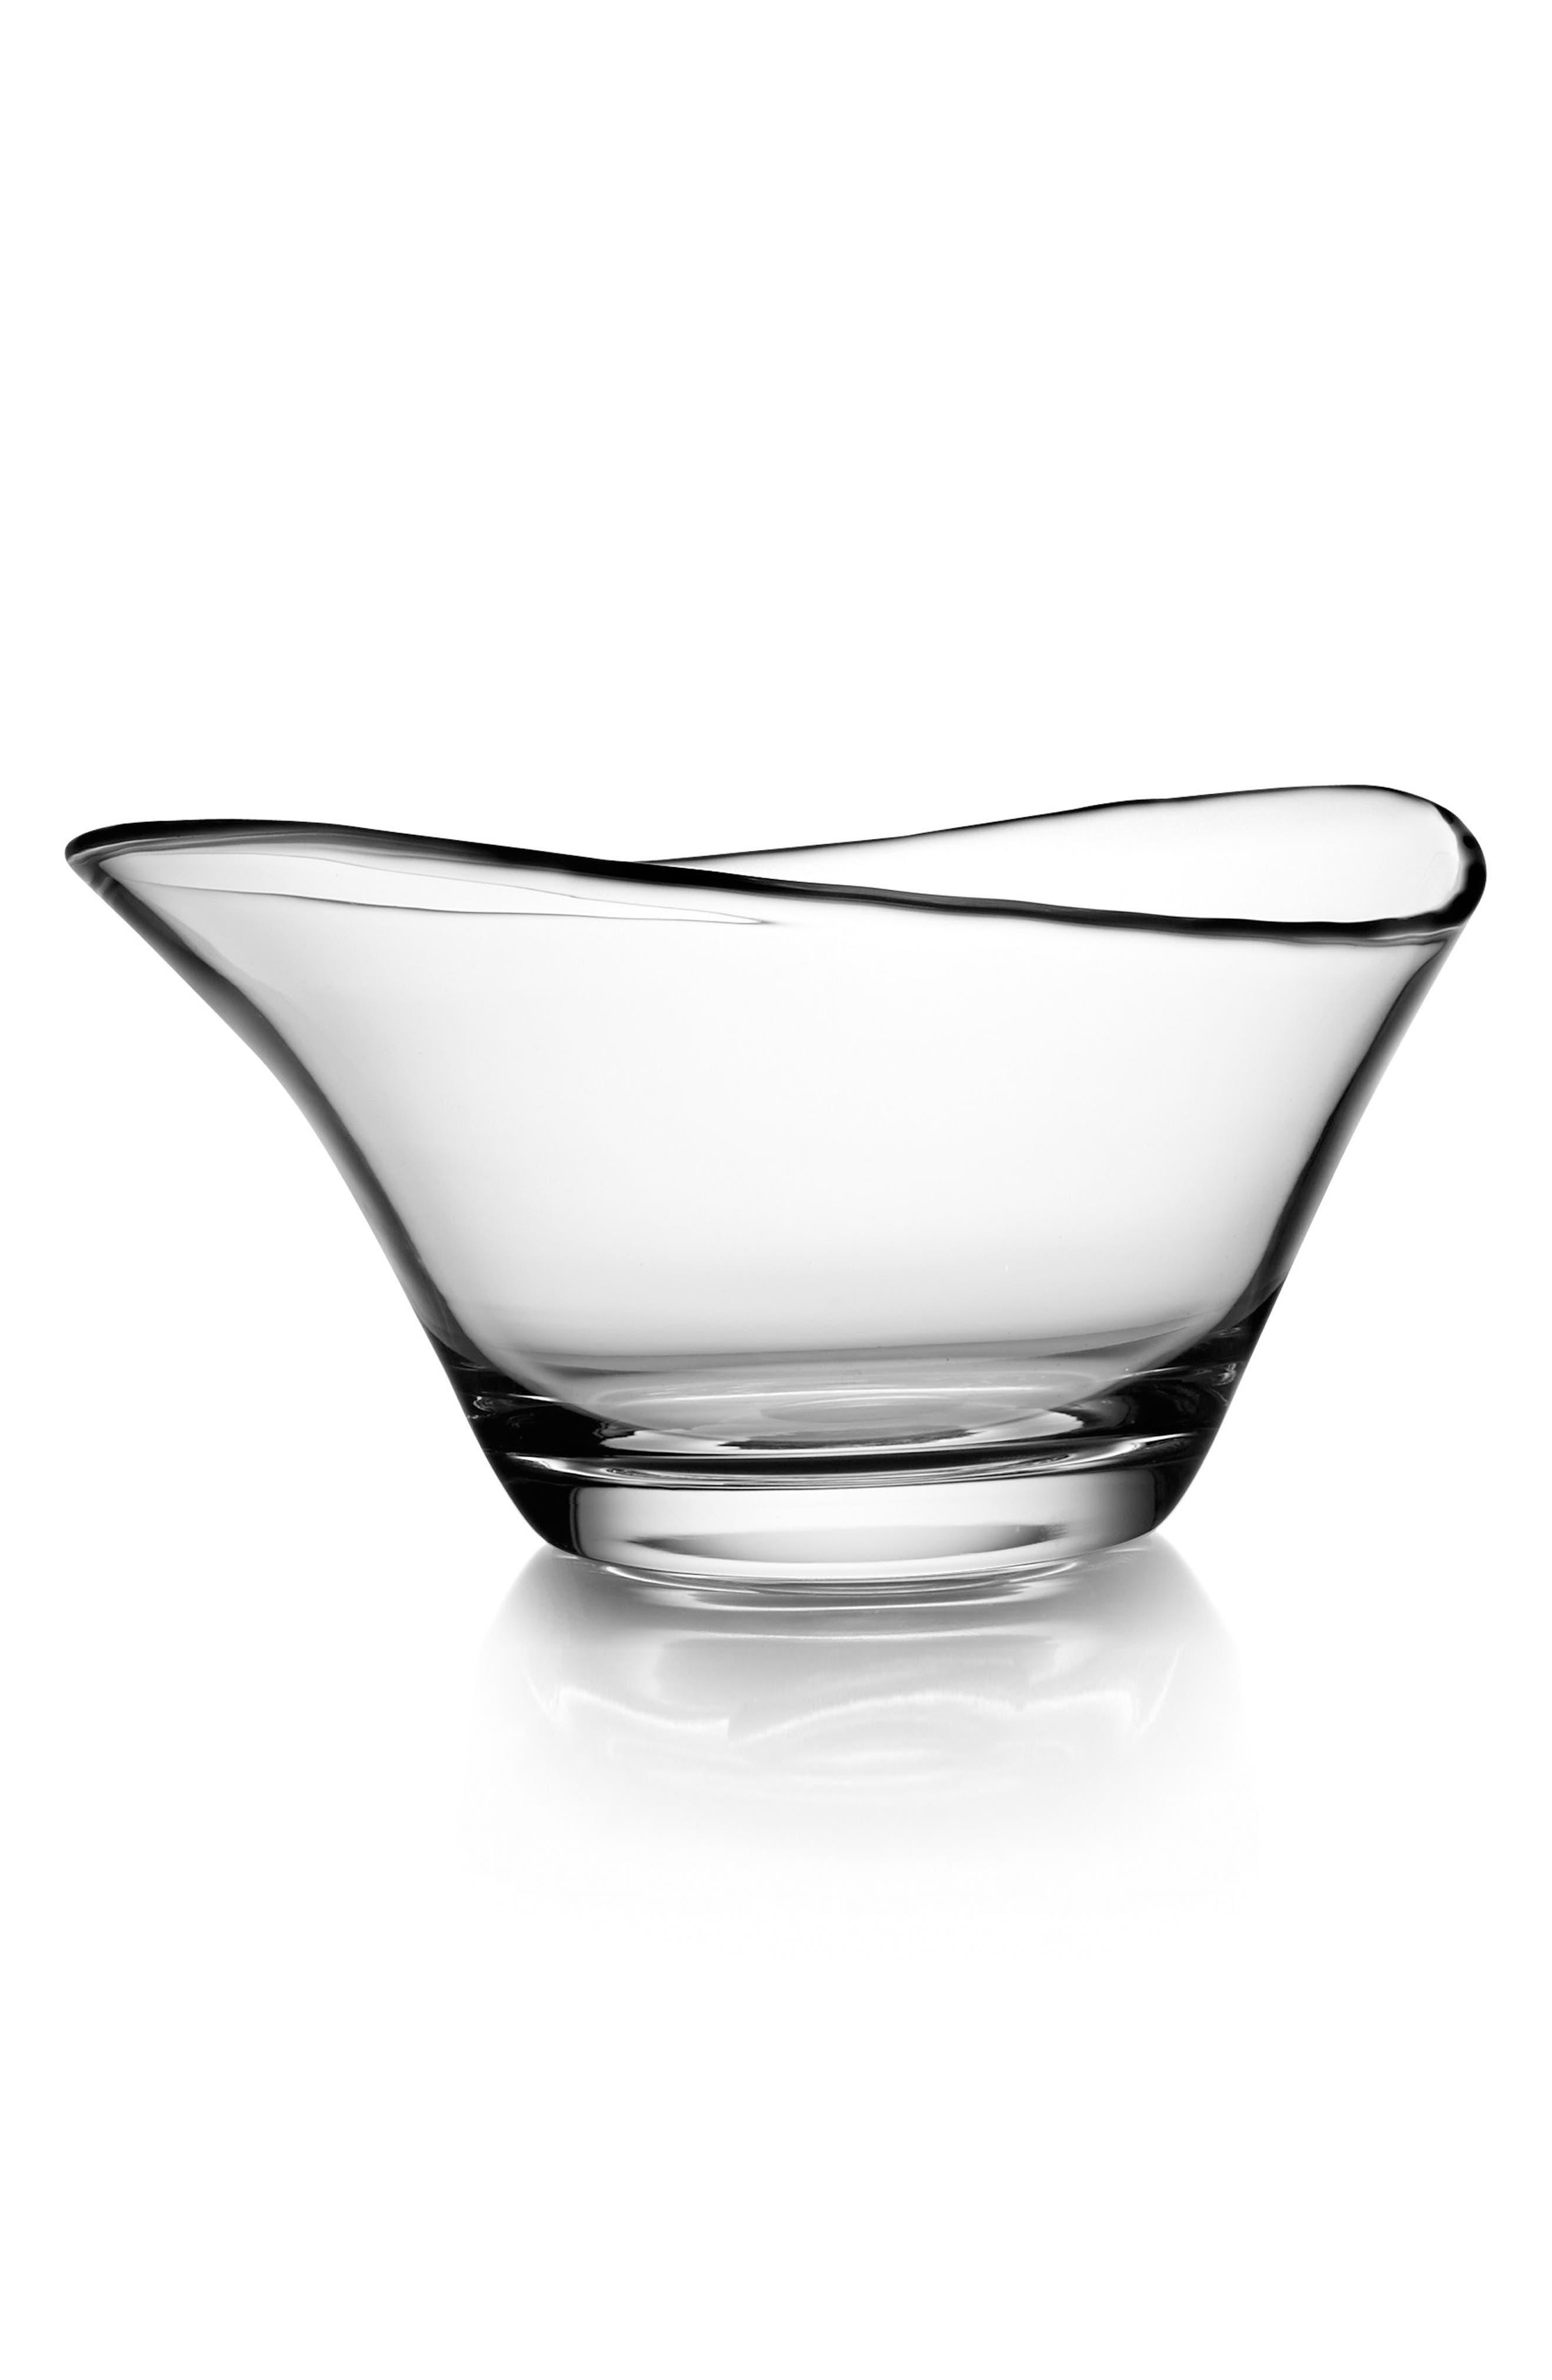 Large Moderne Bowl,                             Main thumbnail 1, color,                             100